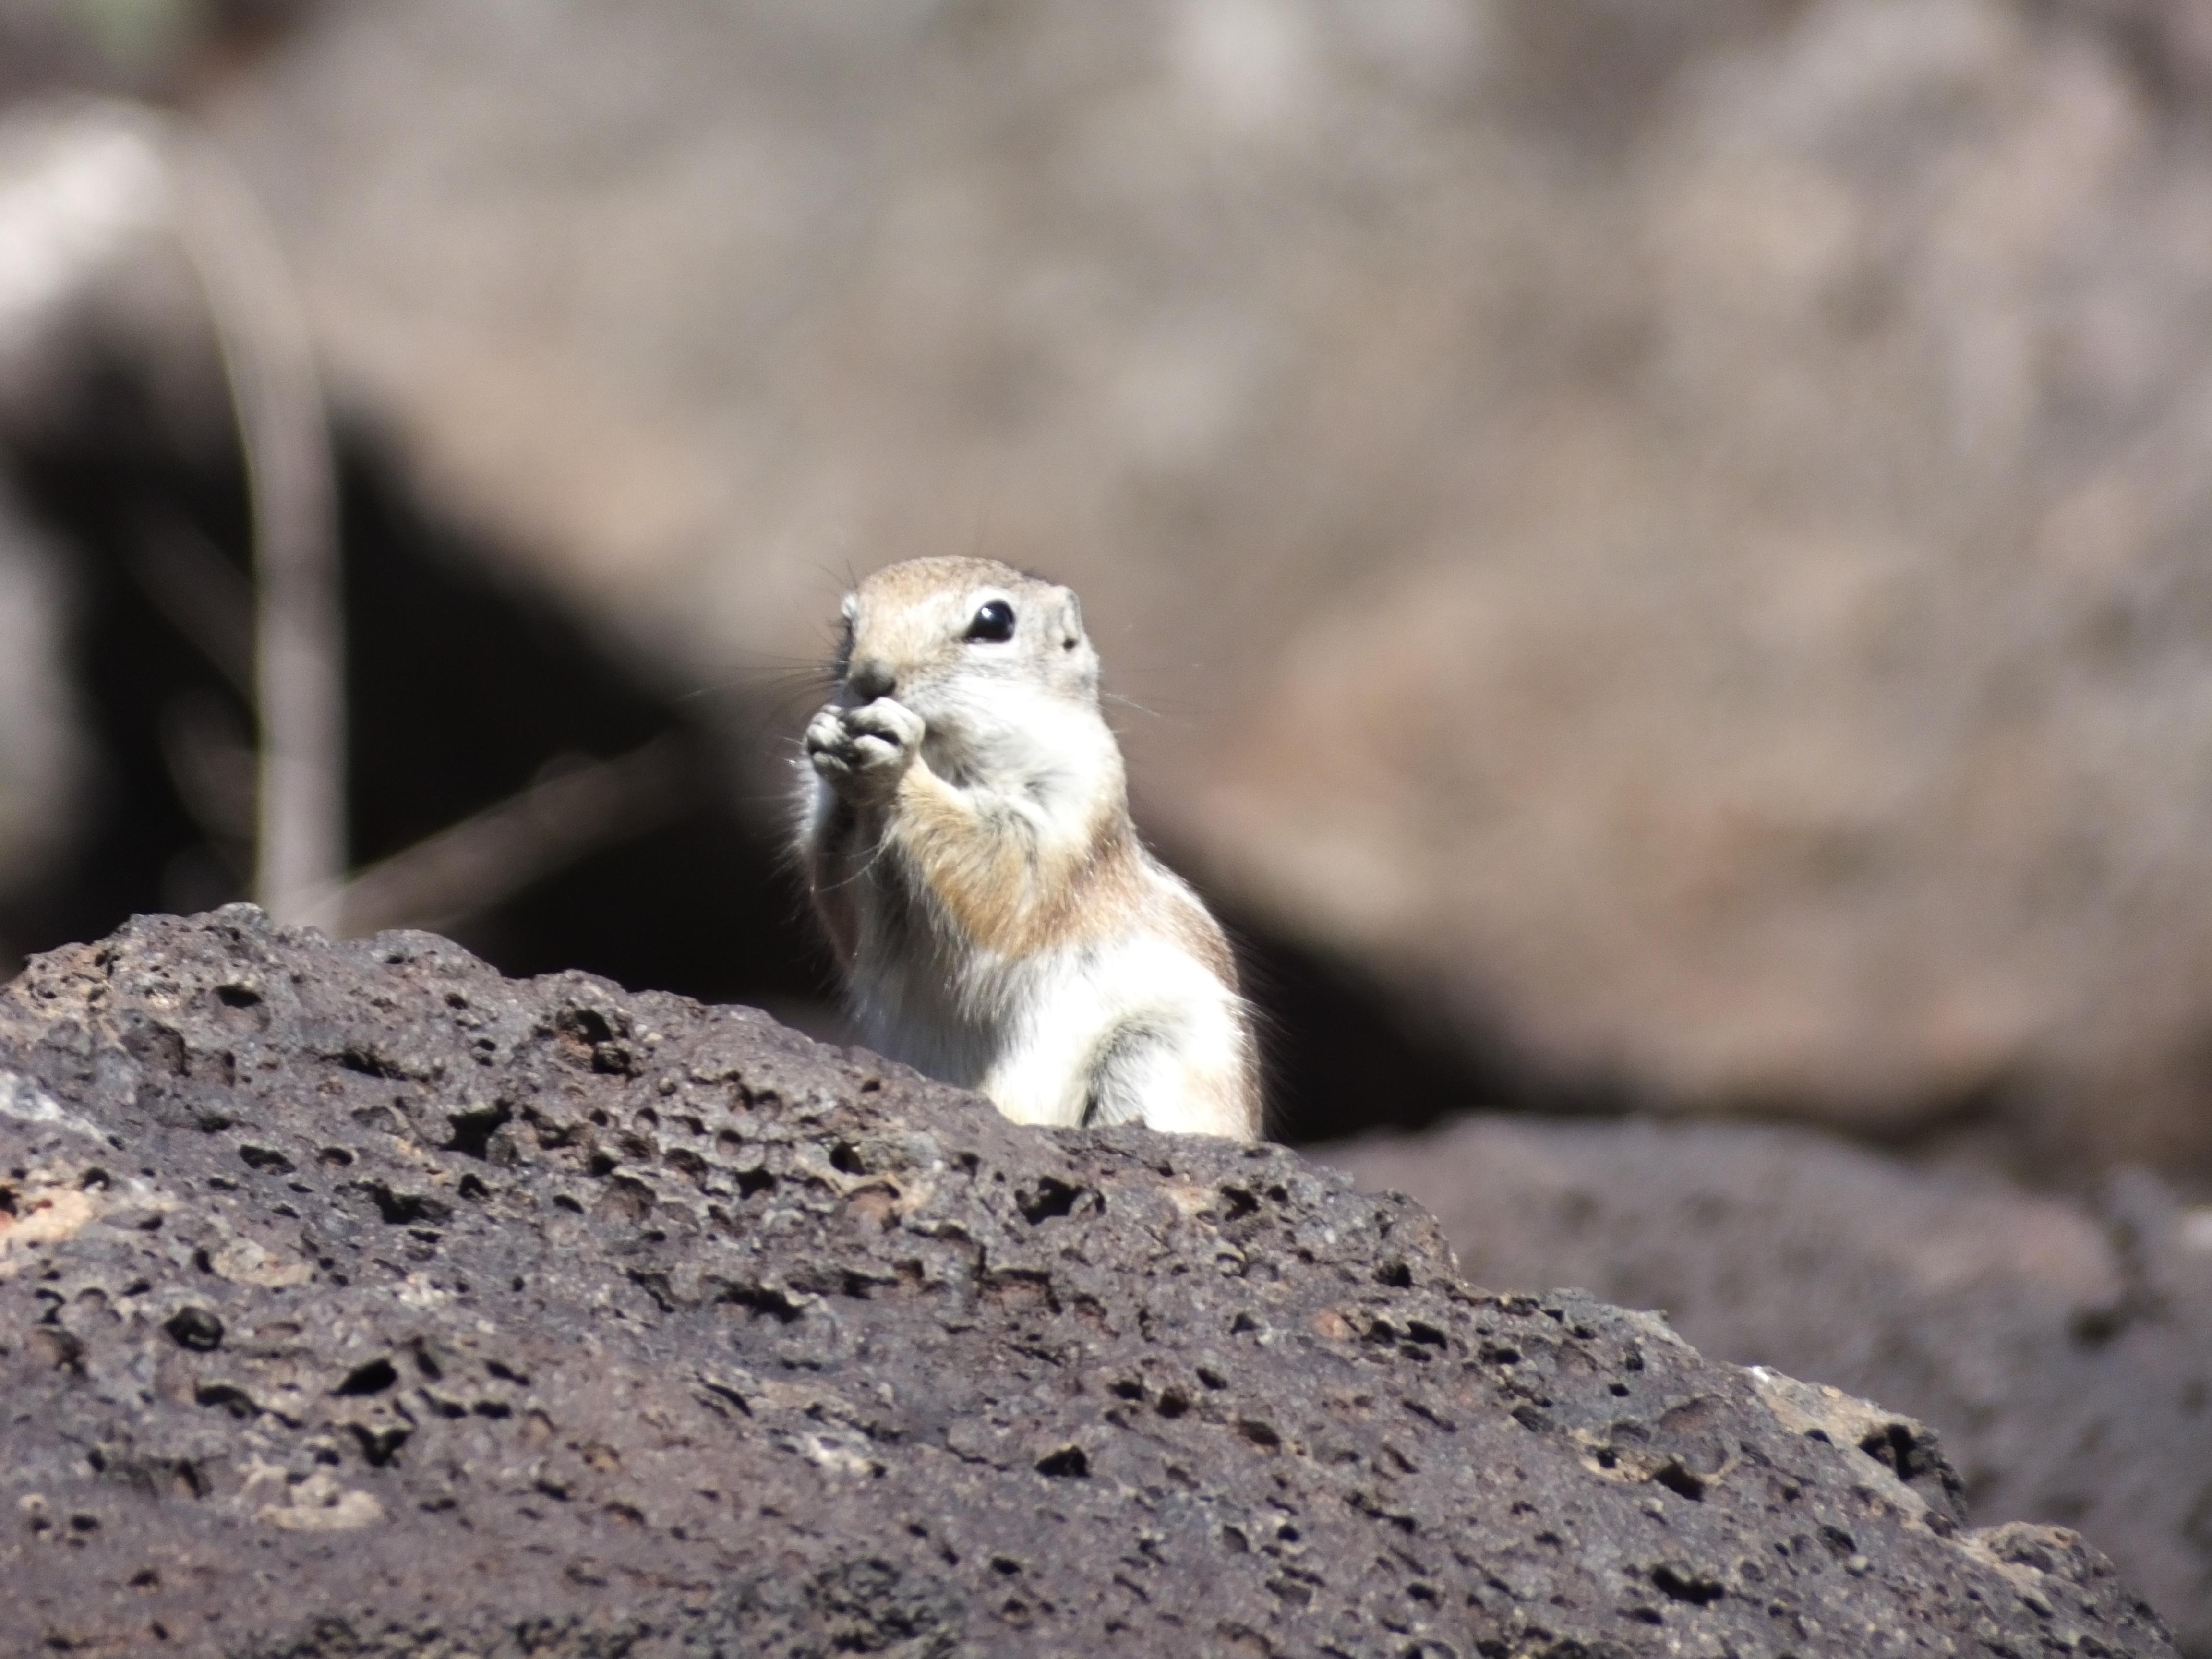 New Mexico Rodent Albuquerque New Mexico